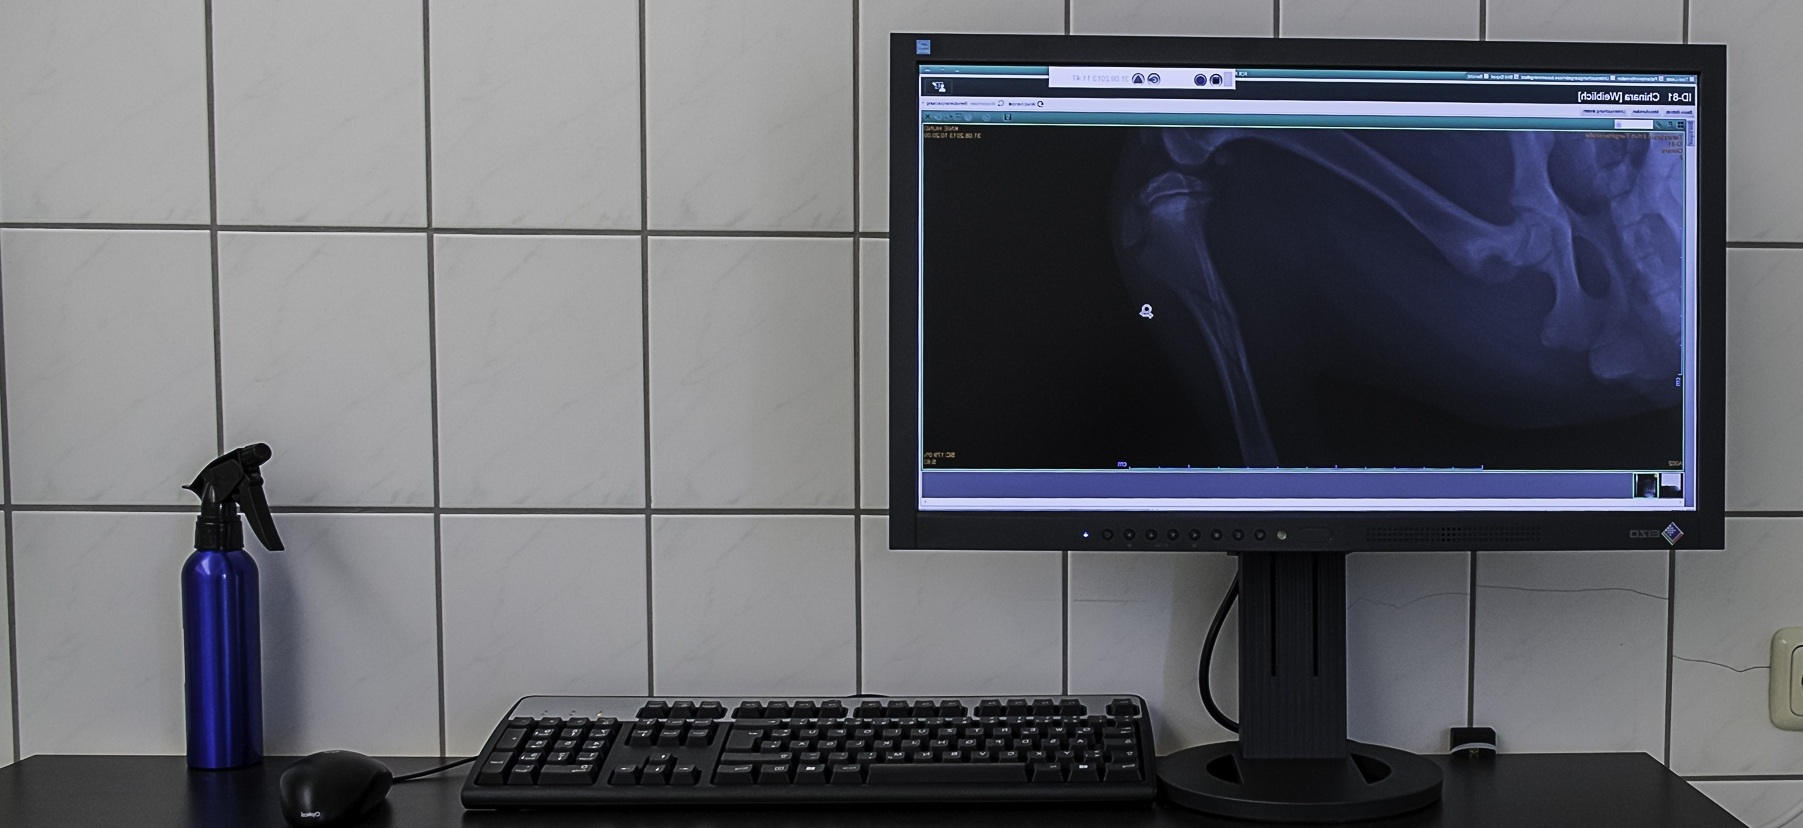 Ankunft unseres Röntgengerätes